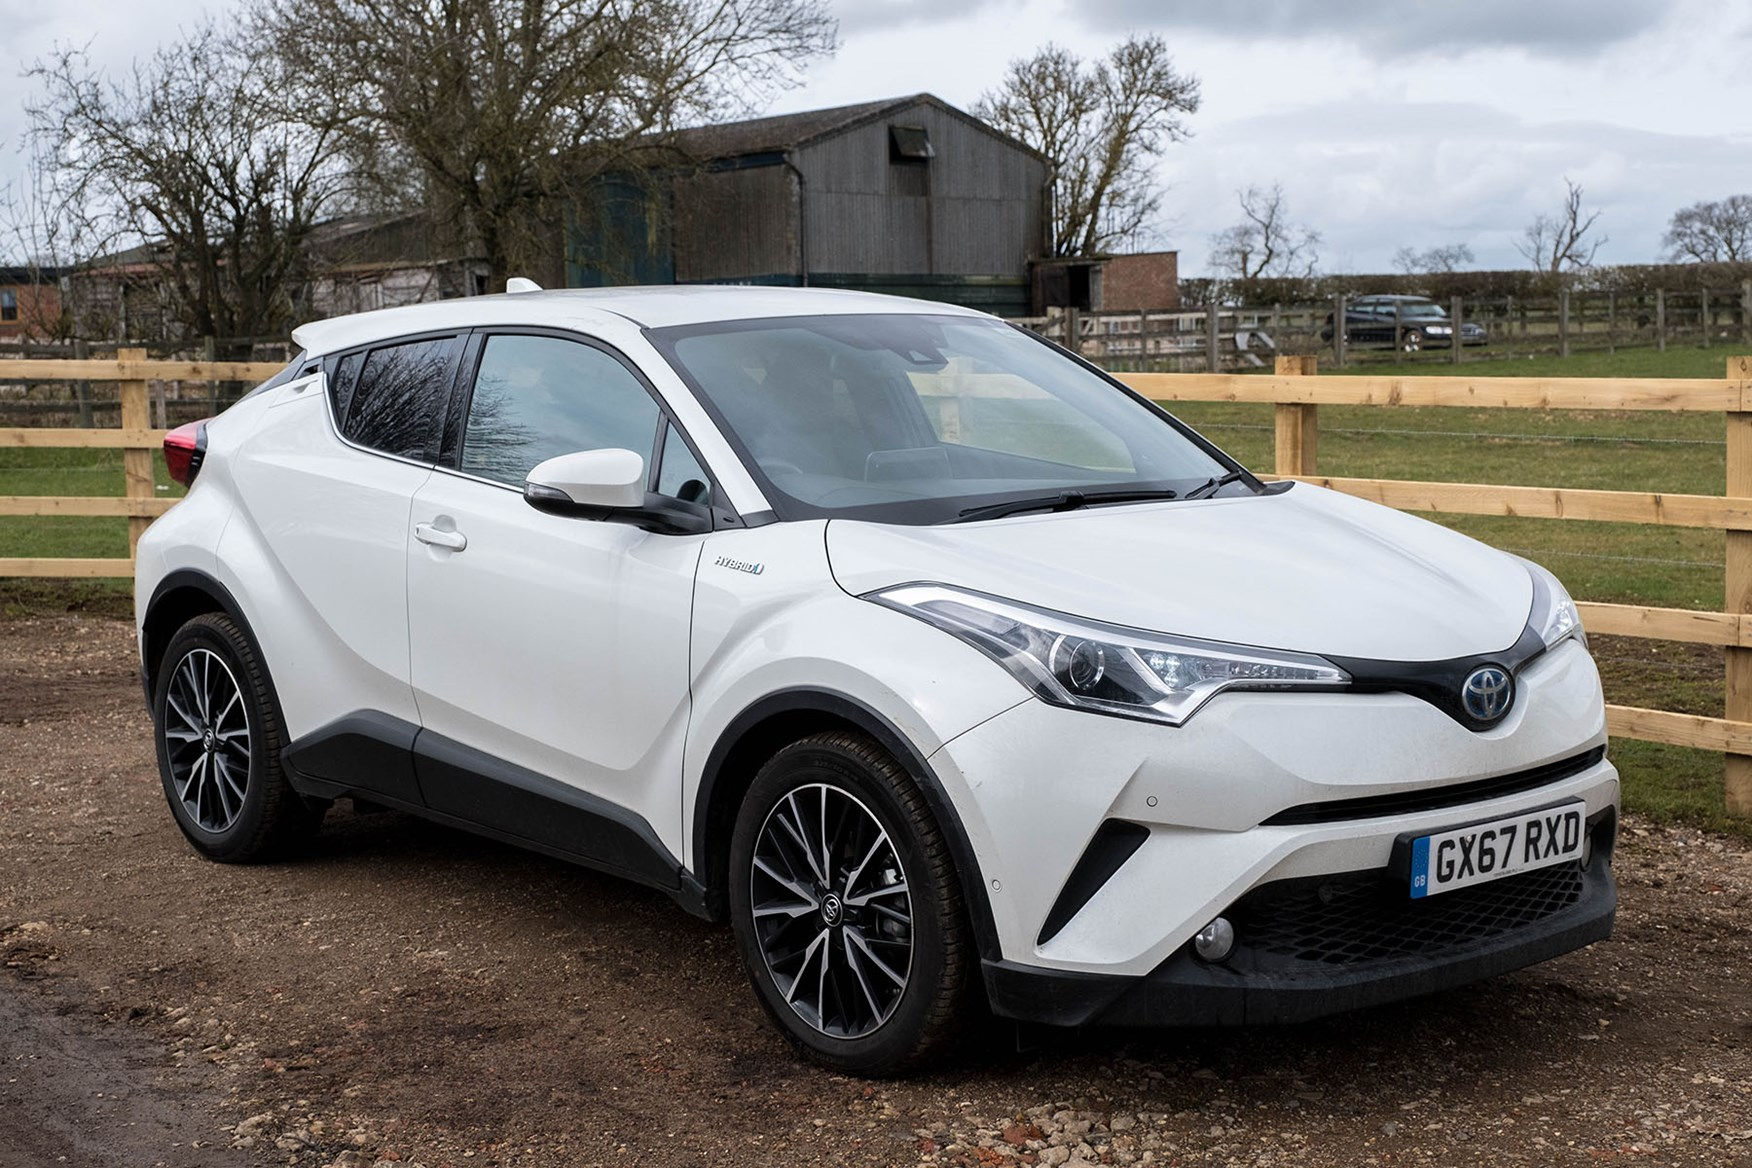 2017 Toyota C-HR - white, Excel Hybrid